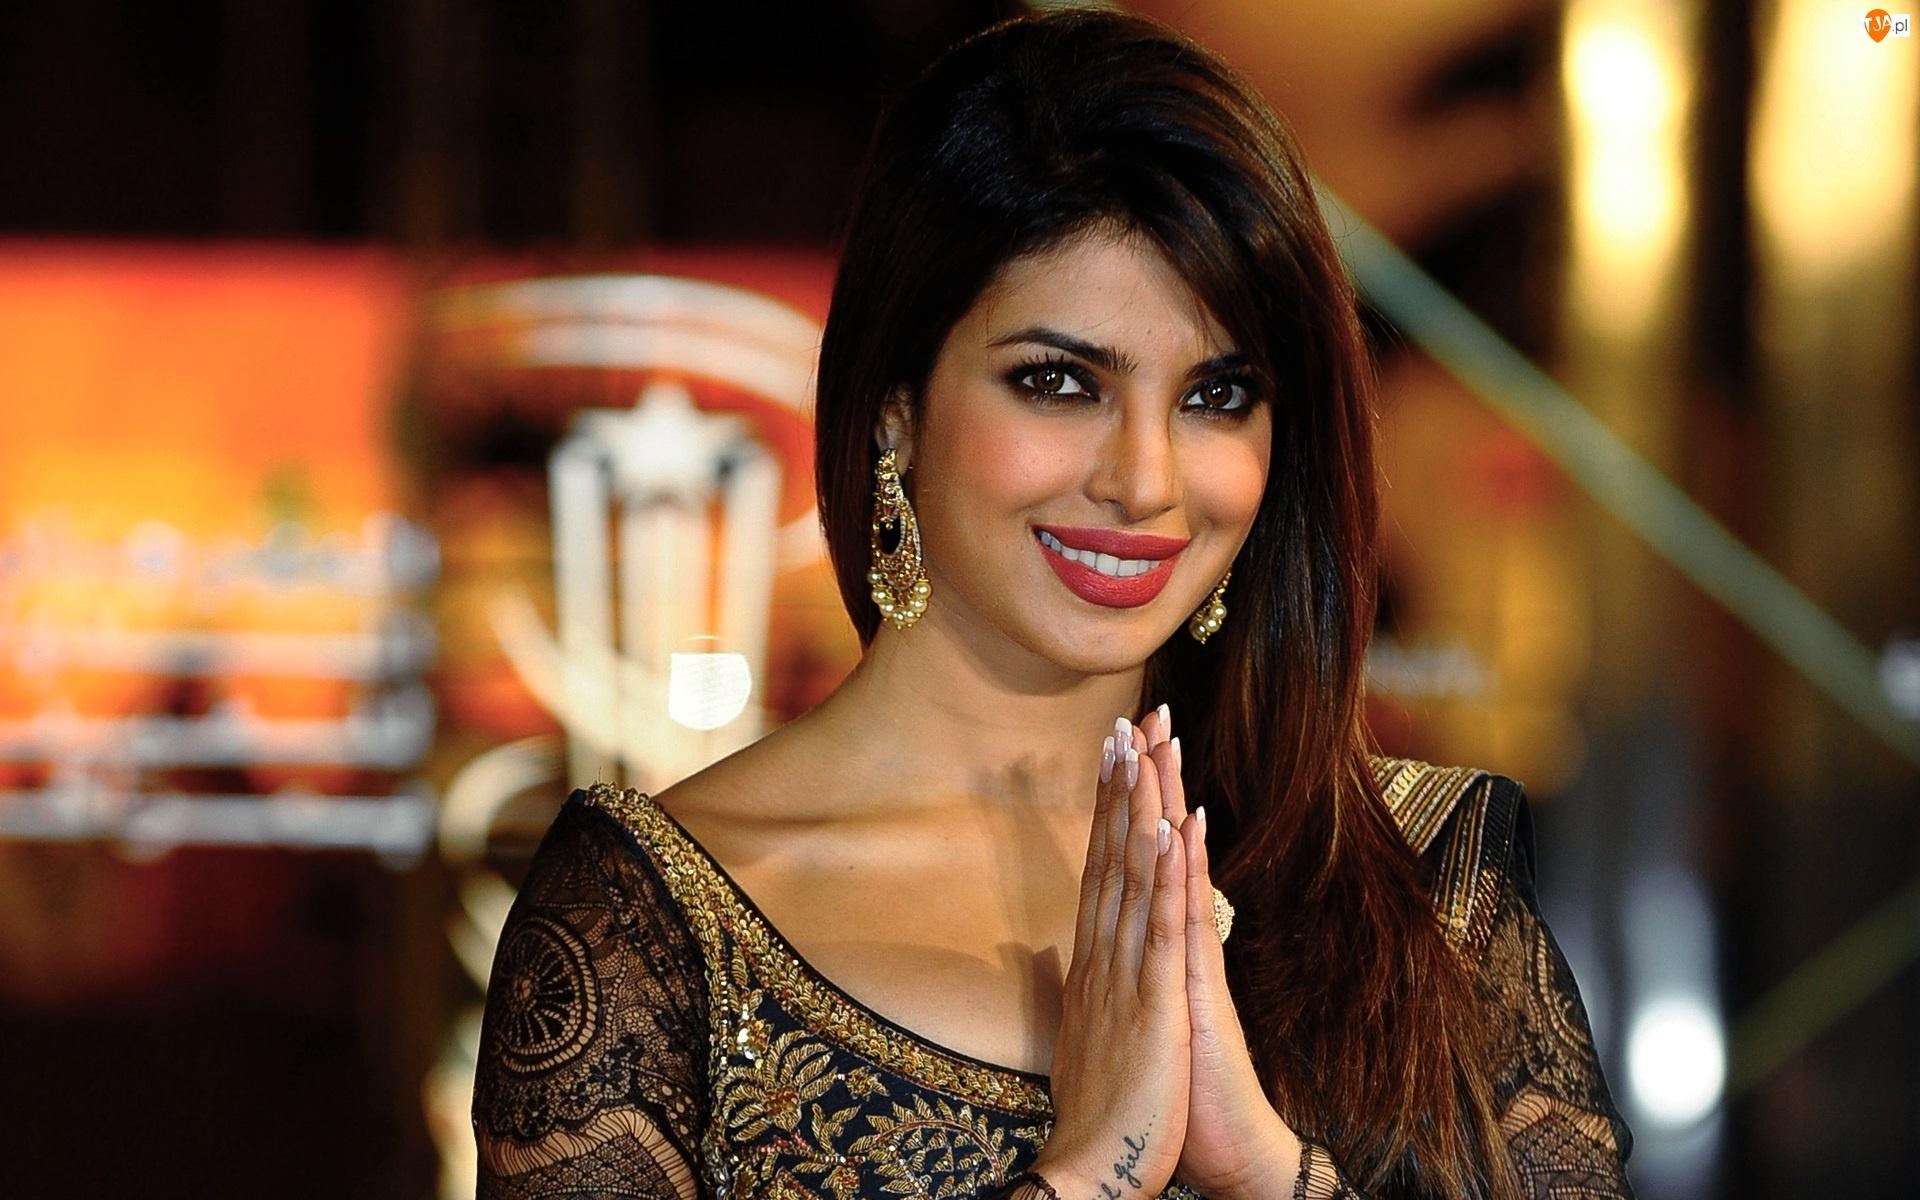 Chopra, Aktorka, Bollywood, Kobieta, Priyanka